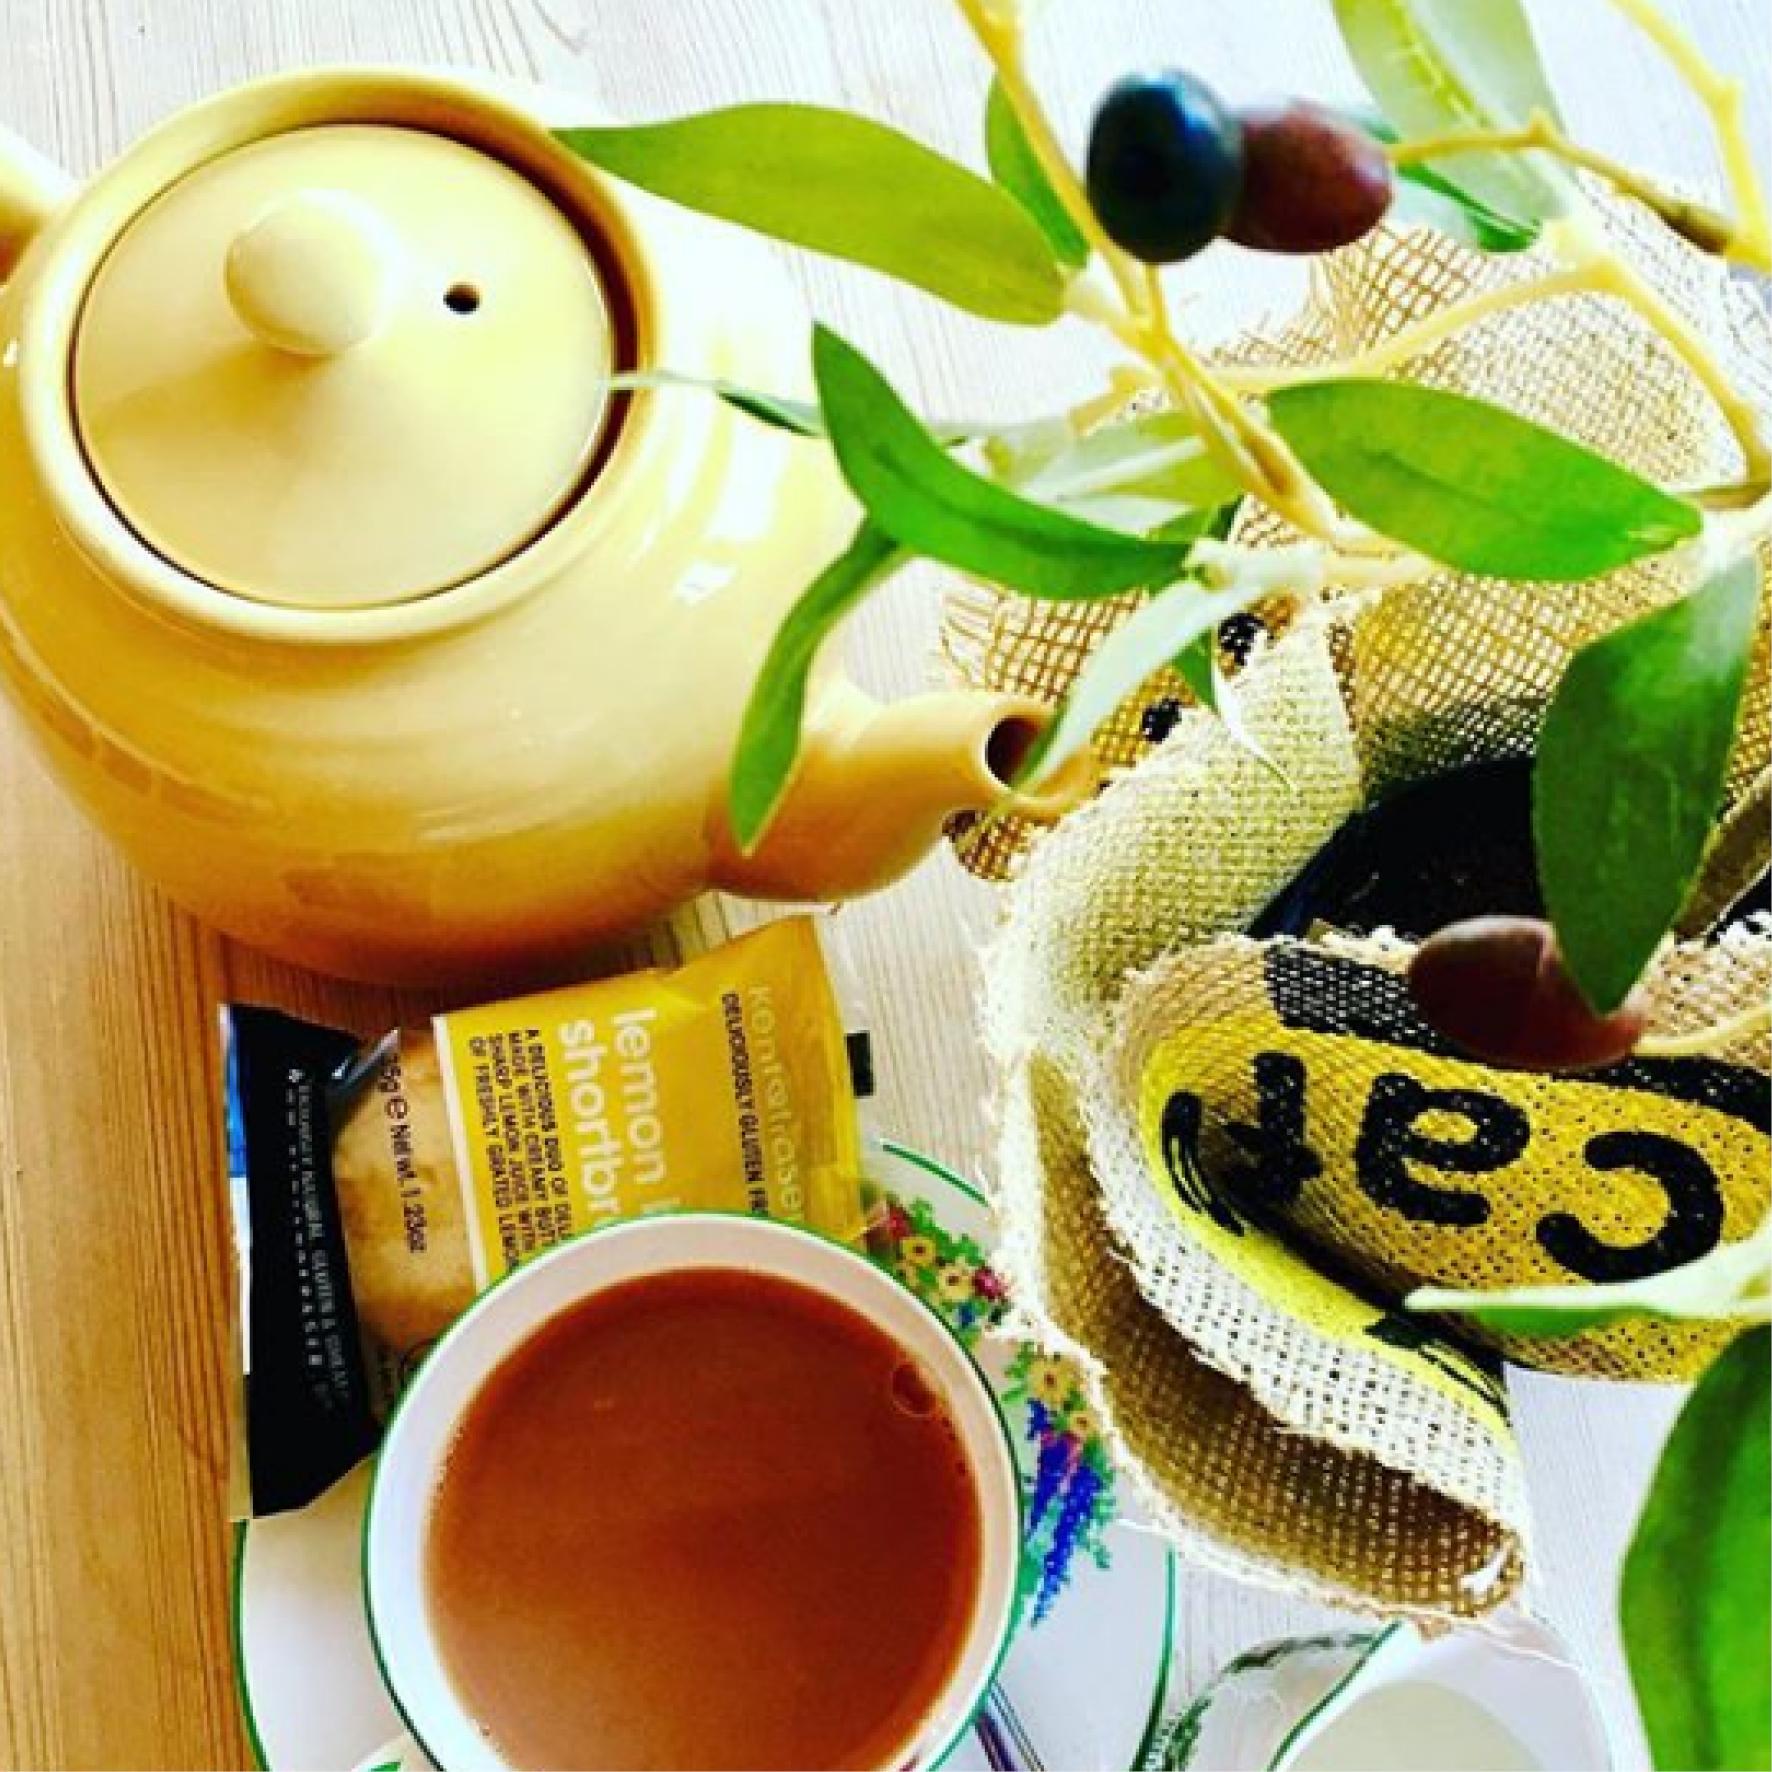 English Breakfast and Herbal Teas